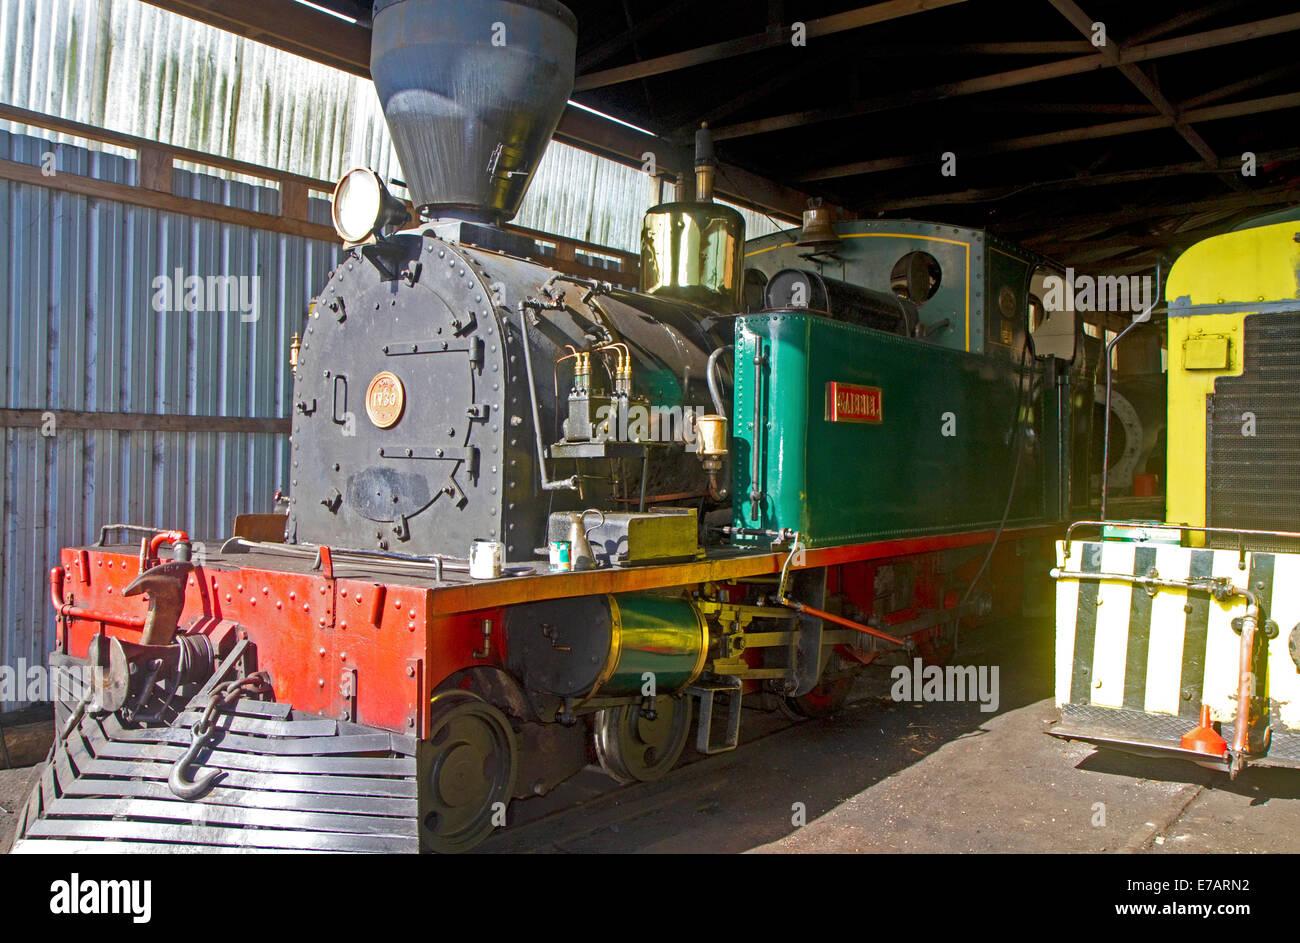 Bay of Islands Vintage Railway locomotive at the town of Kawakawa, North Island, New Zealand. - Stock Image